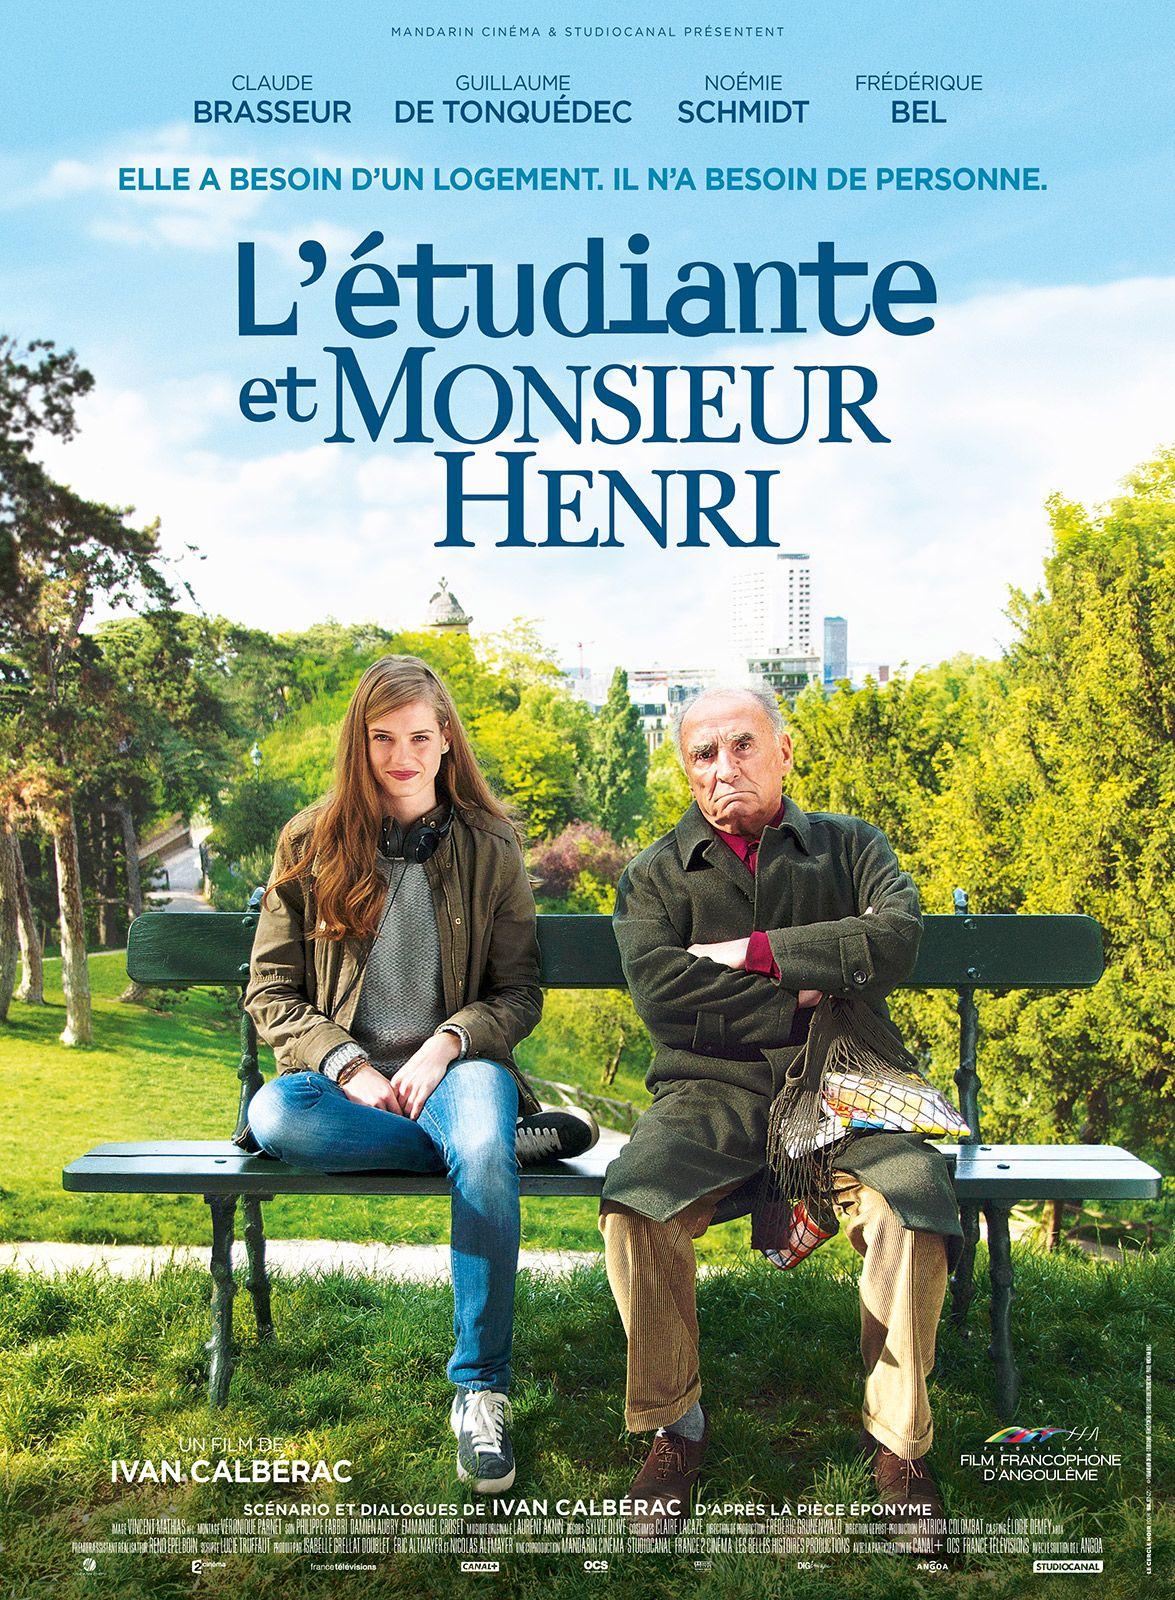 Monsieur Henri